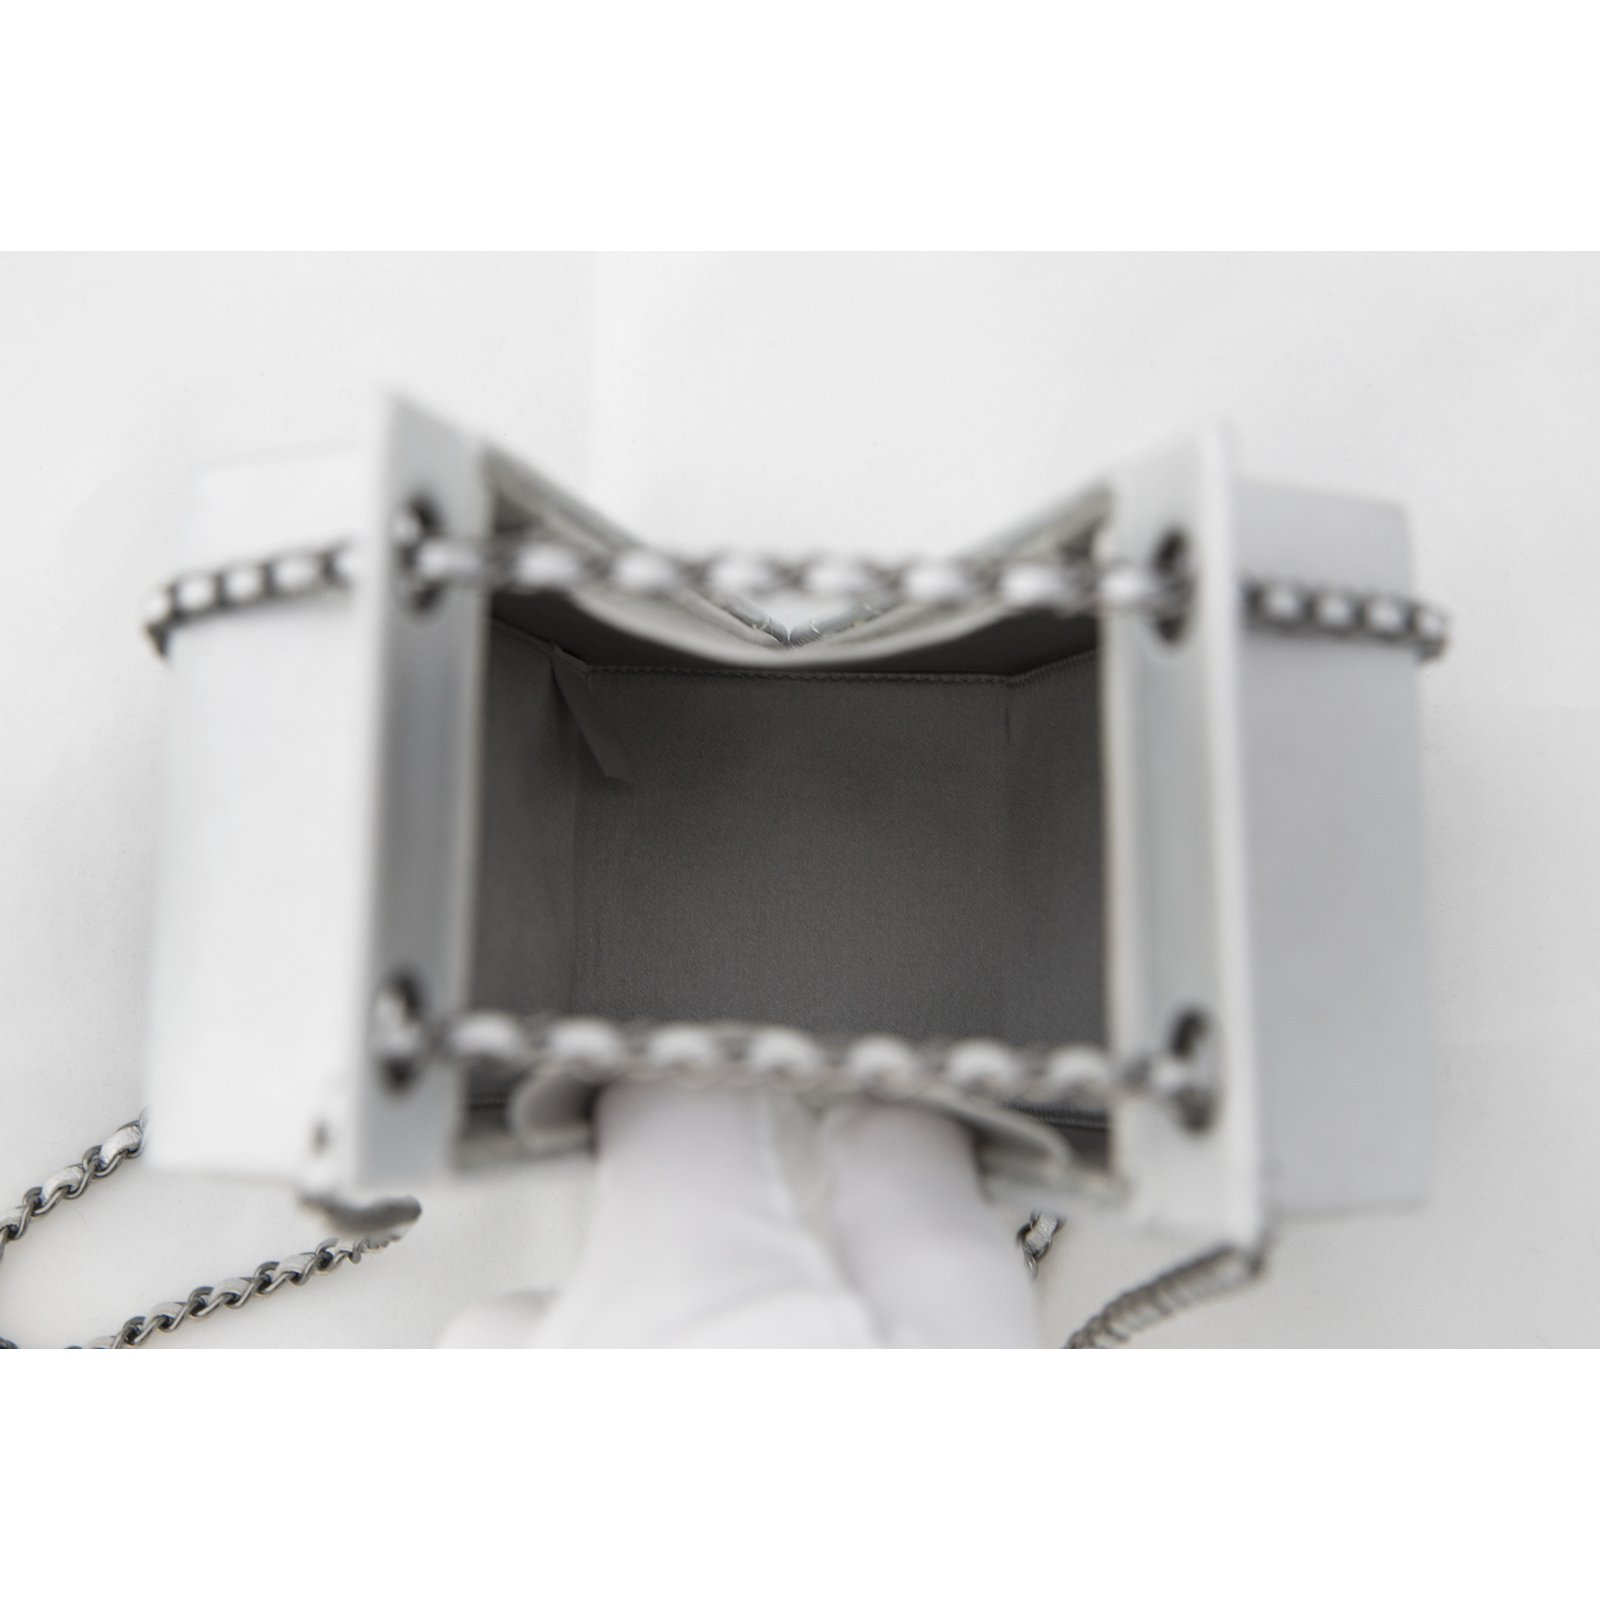 c4282b6a7716 Chanel Lait de Coco Bag 14A Fall 2014 Supermarket Collection Handbags  Leather,Goatskin Silvery ref.49652 - Joli Closet